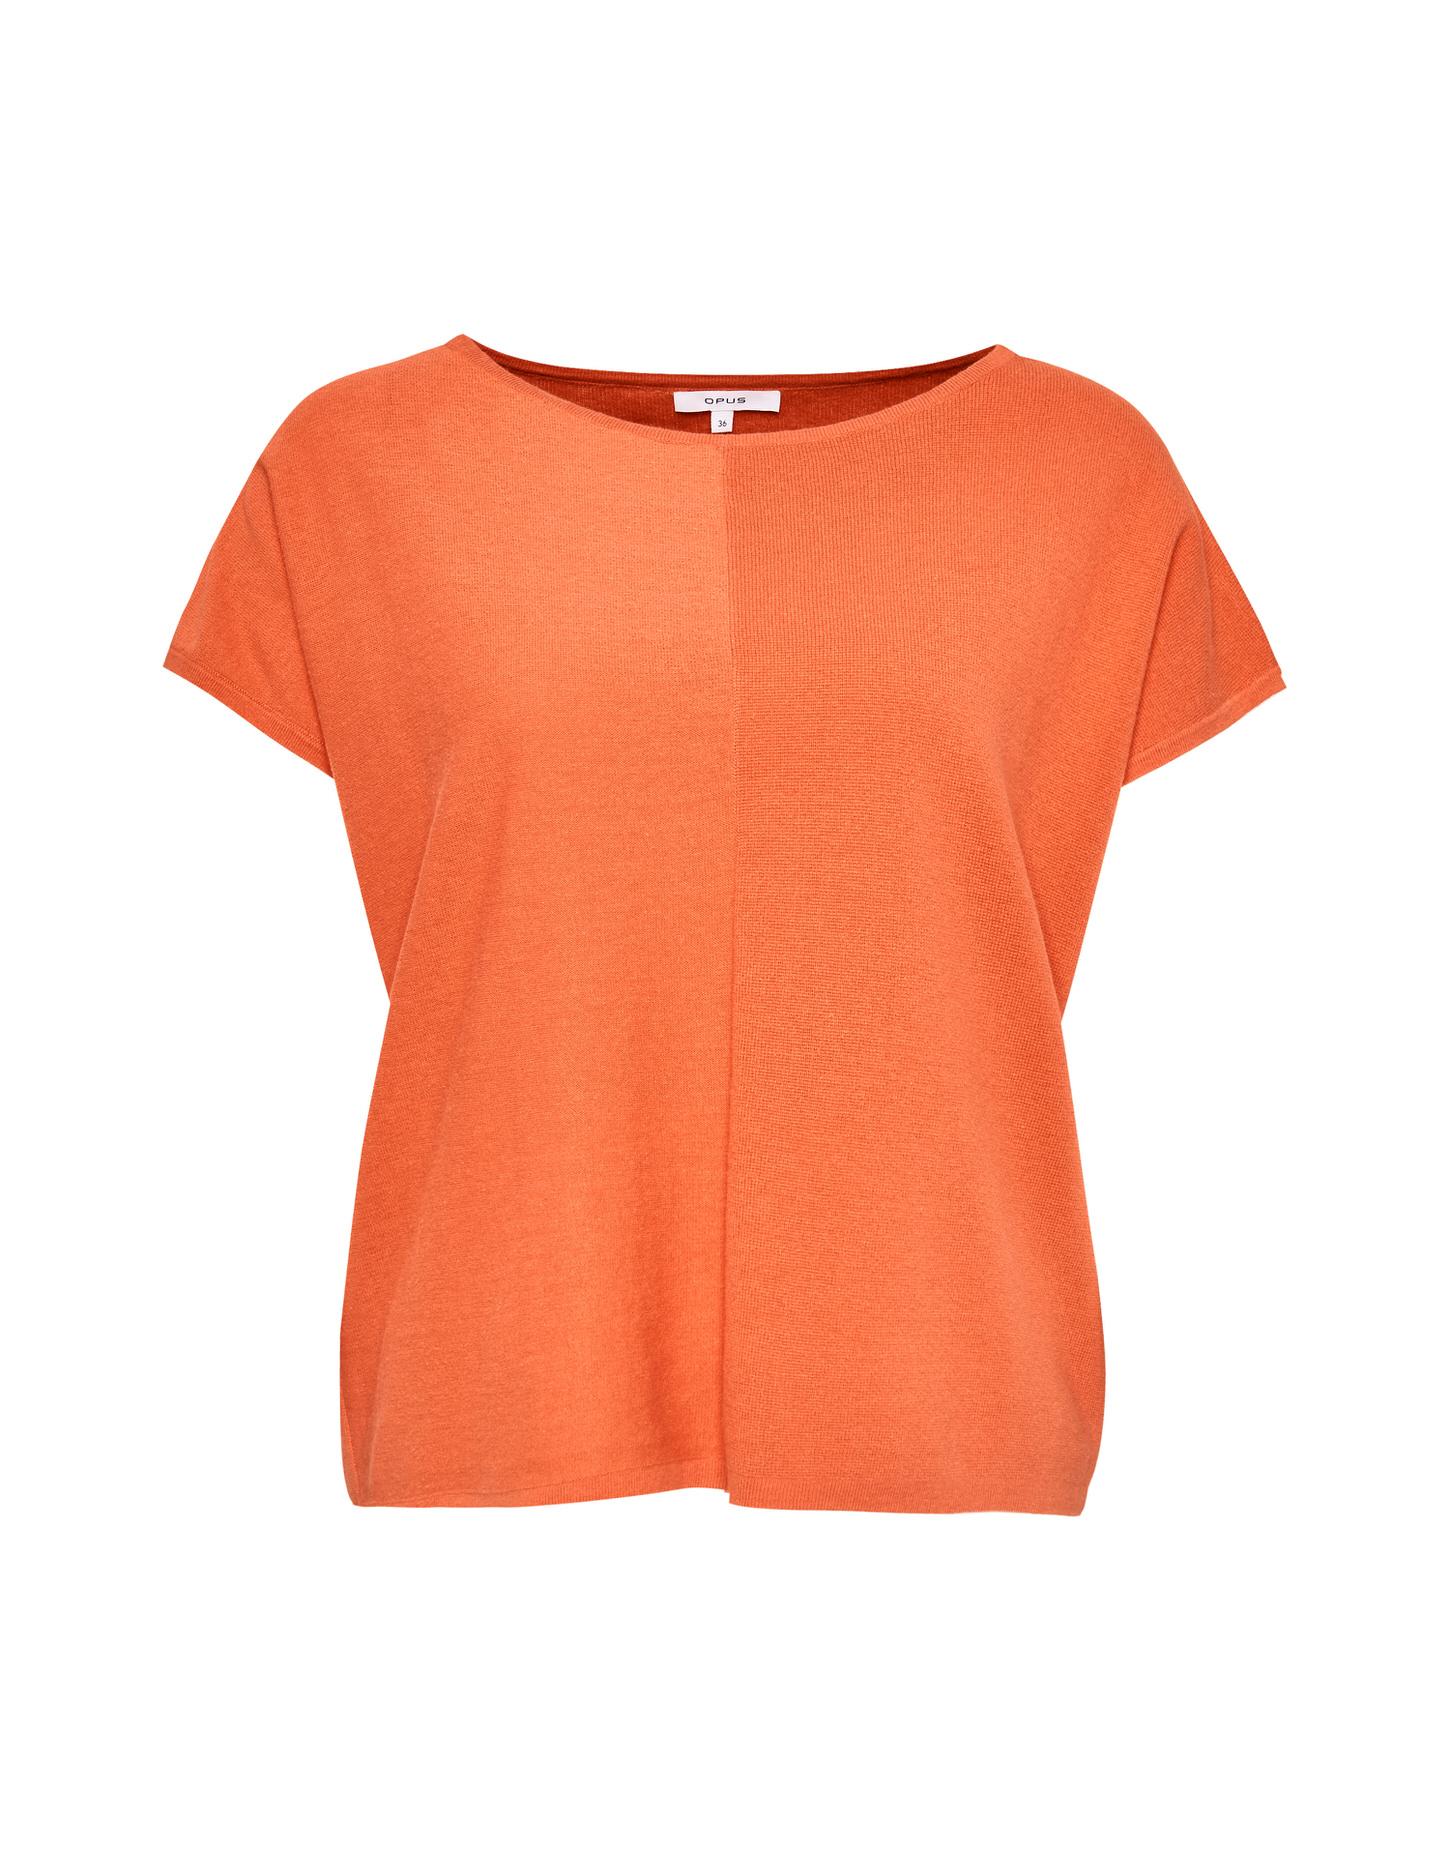 Orange dames top Opus - Preeti 4101